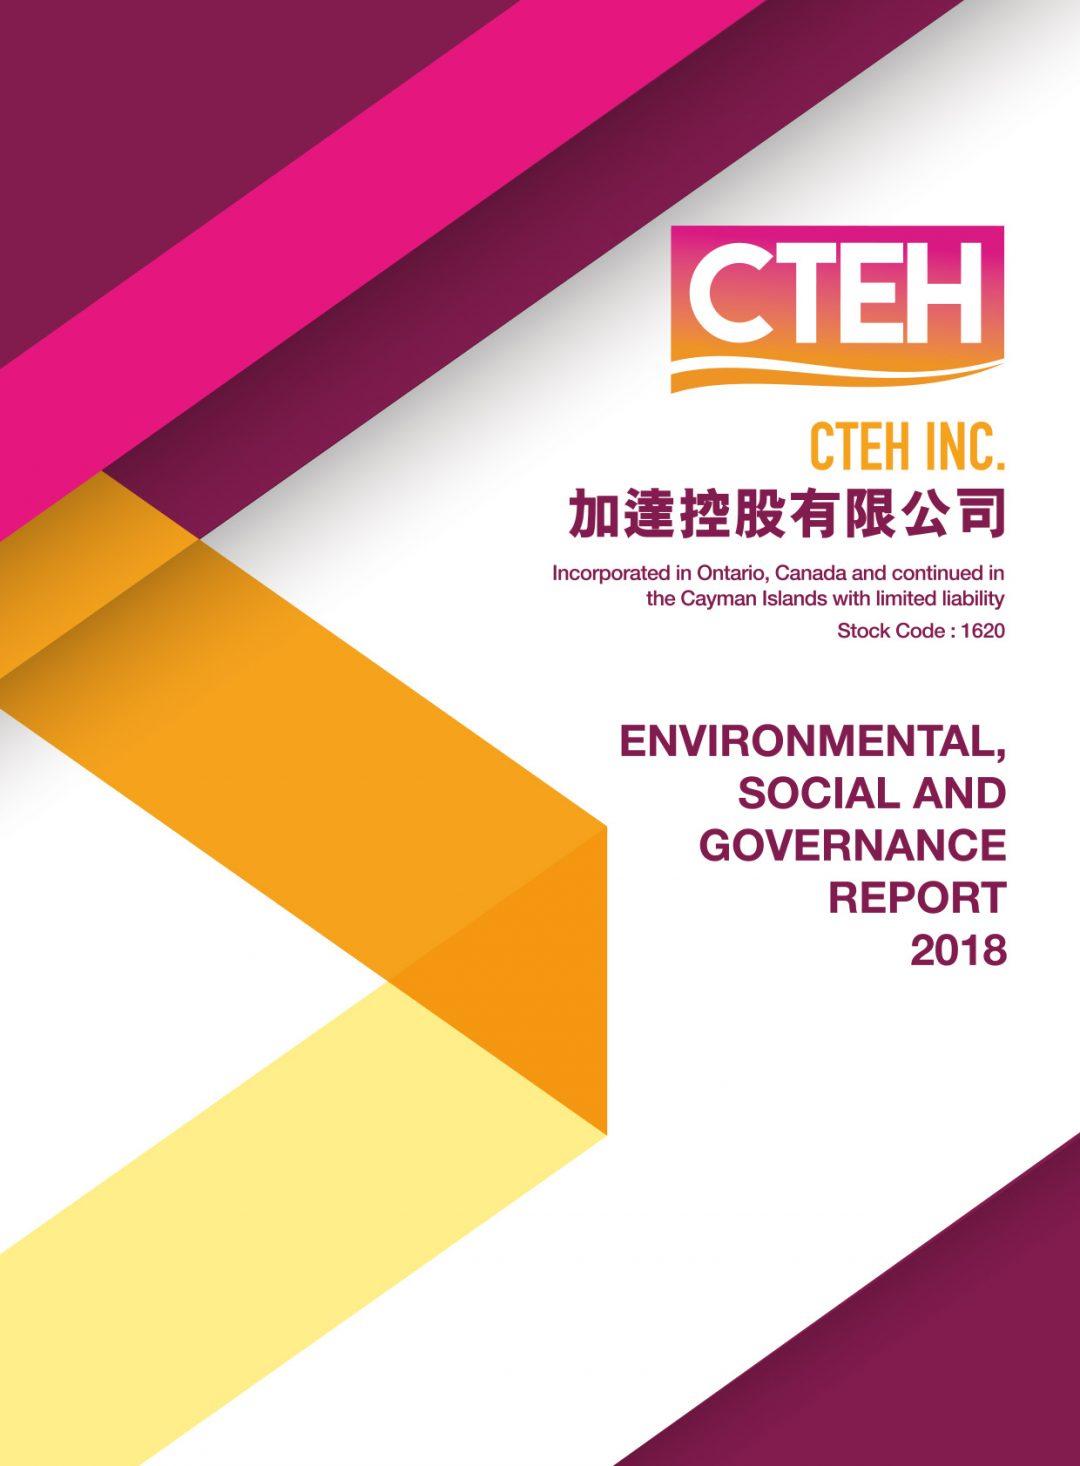 CTEH INC. ESG